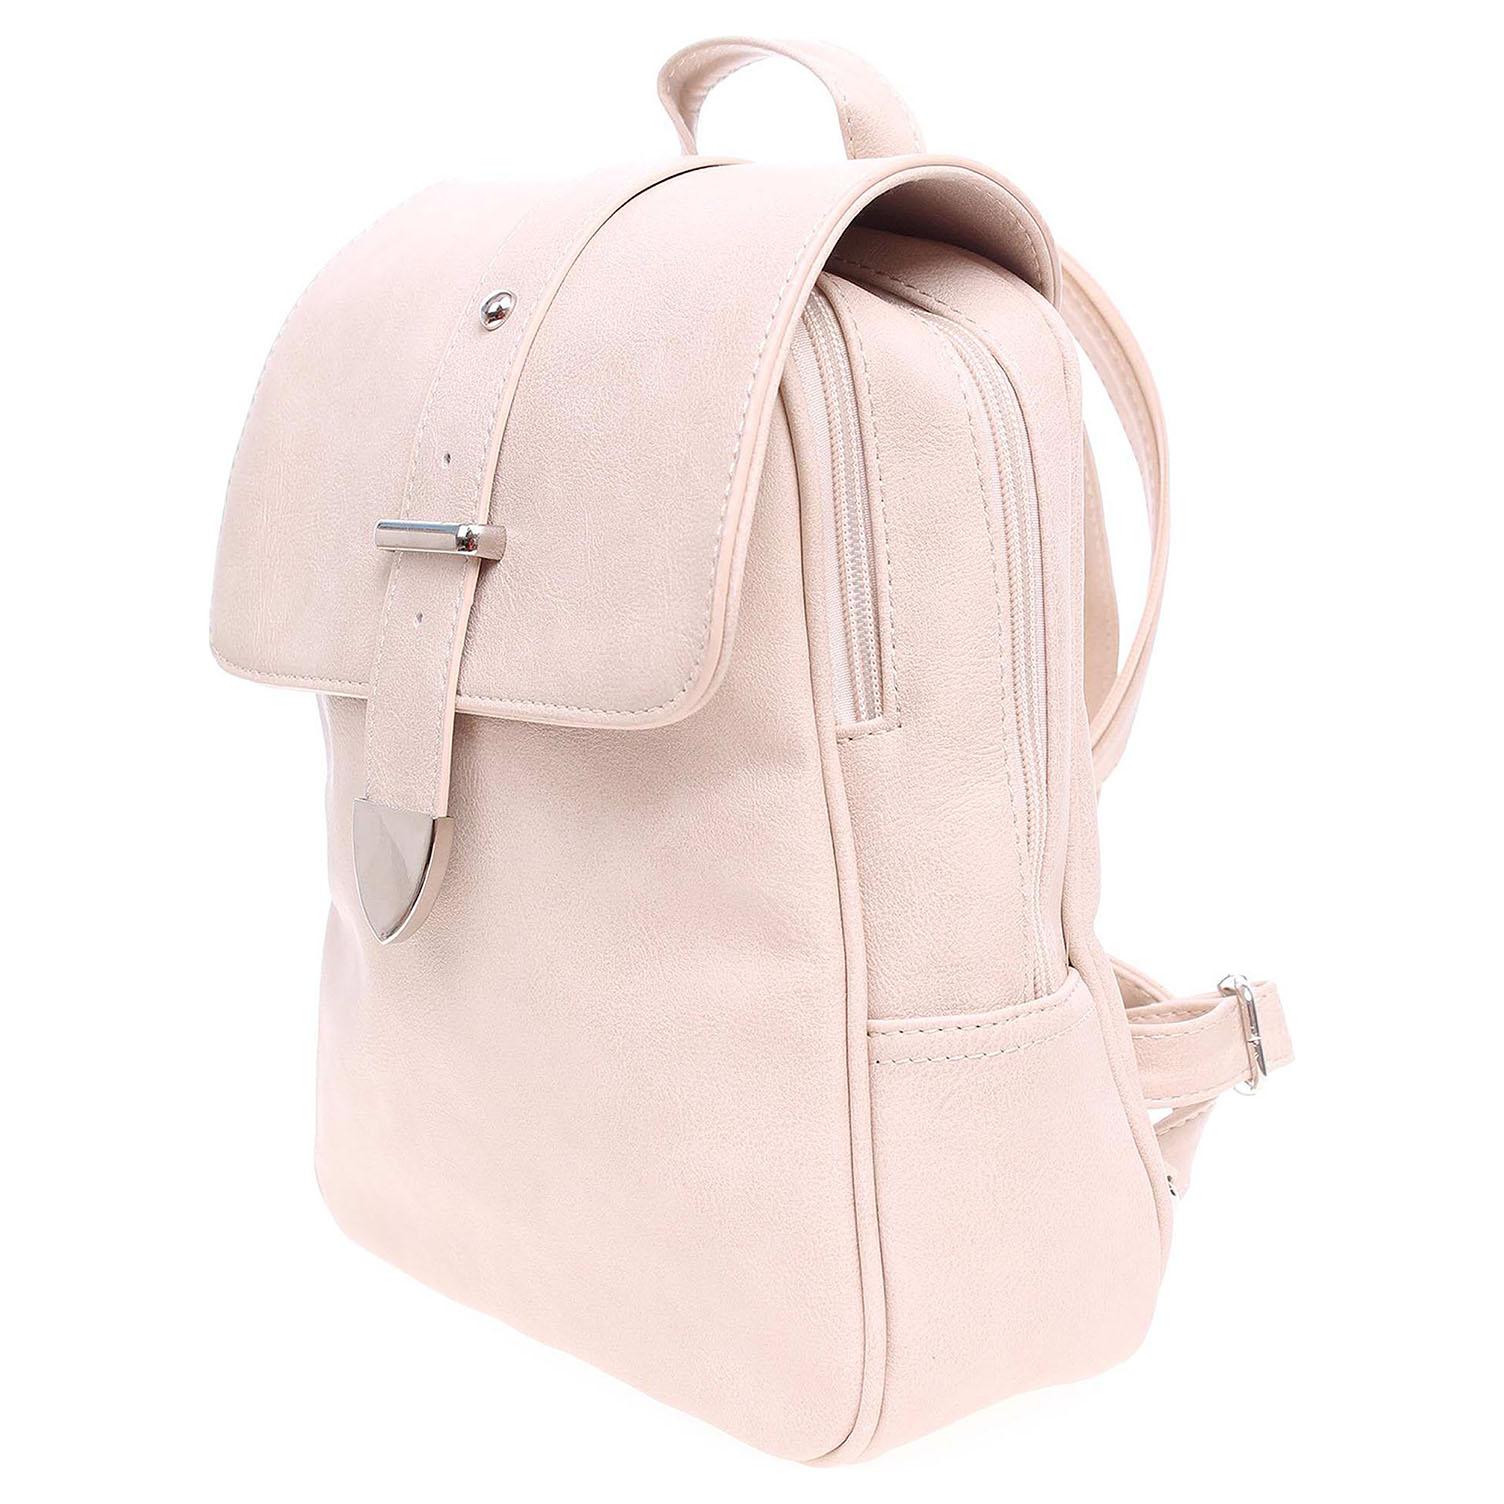 Ecco Dámský batoh J819PC béžový 11601253